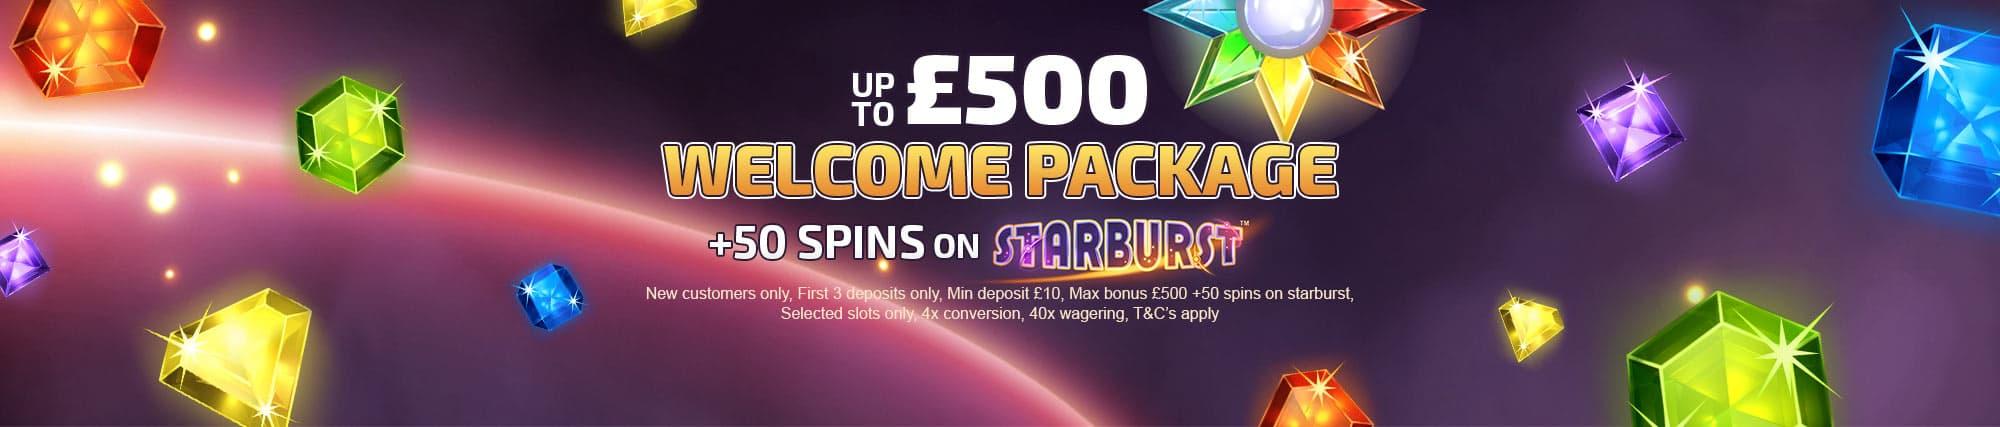 Jackpot mobile welcome bonus